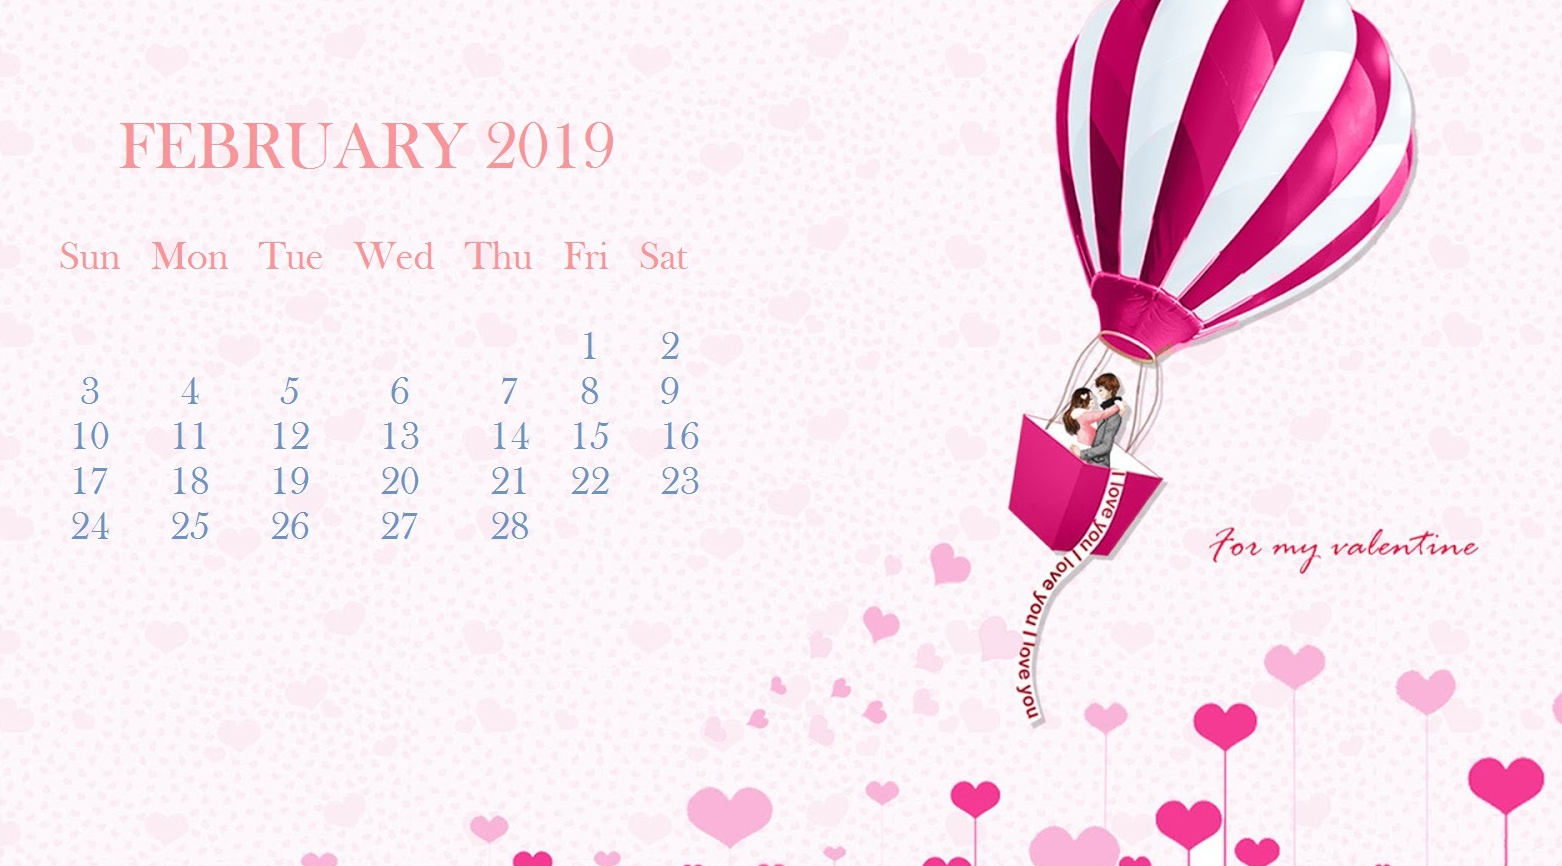 February 2019 Calendar Word Printable - Free Printable 2018 Calendar Feb 9 2019 Calendar